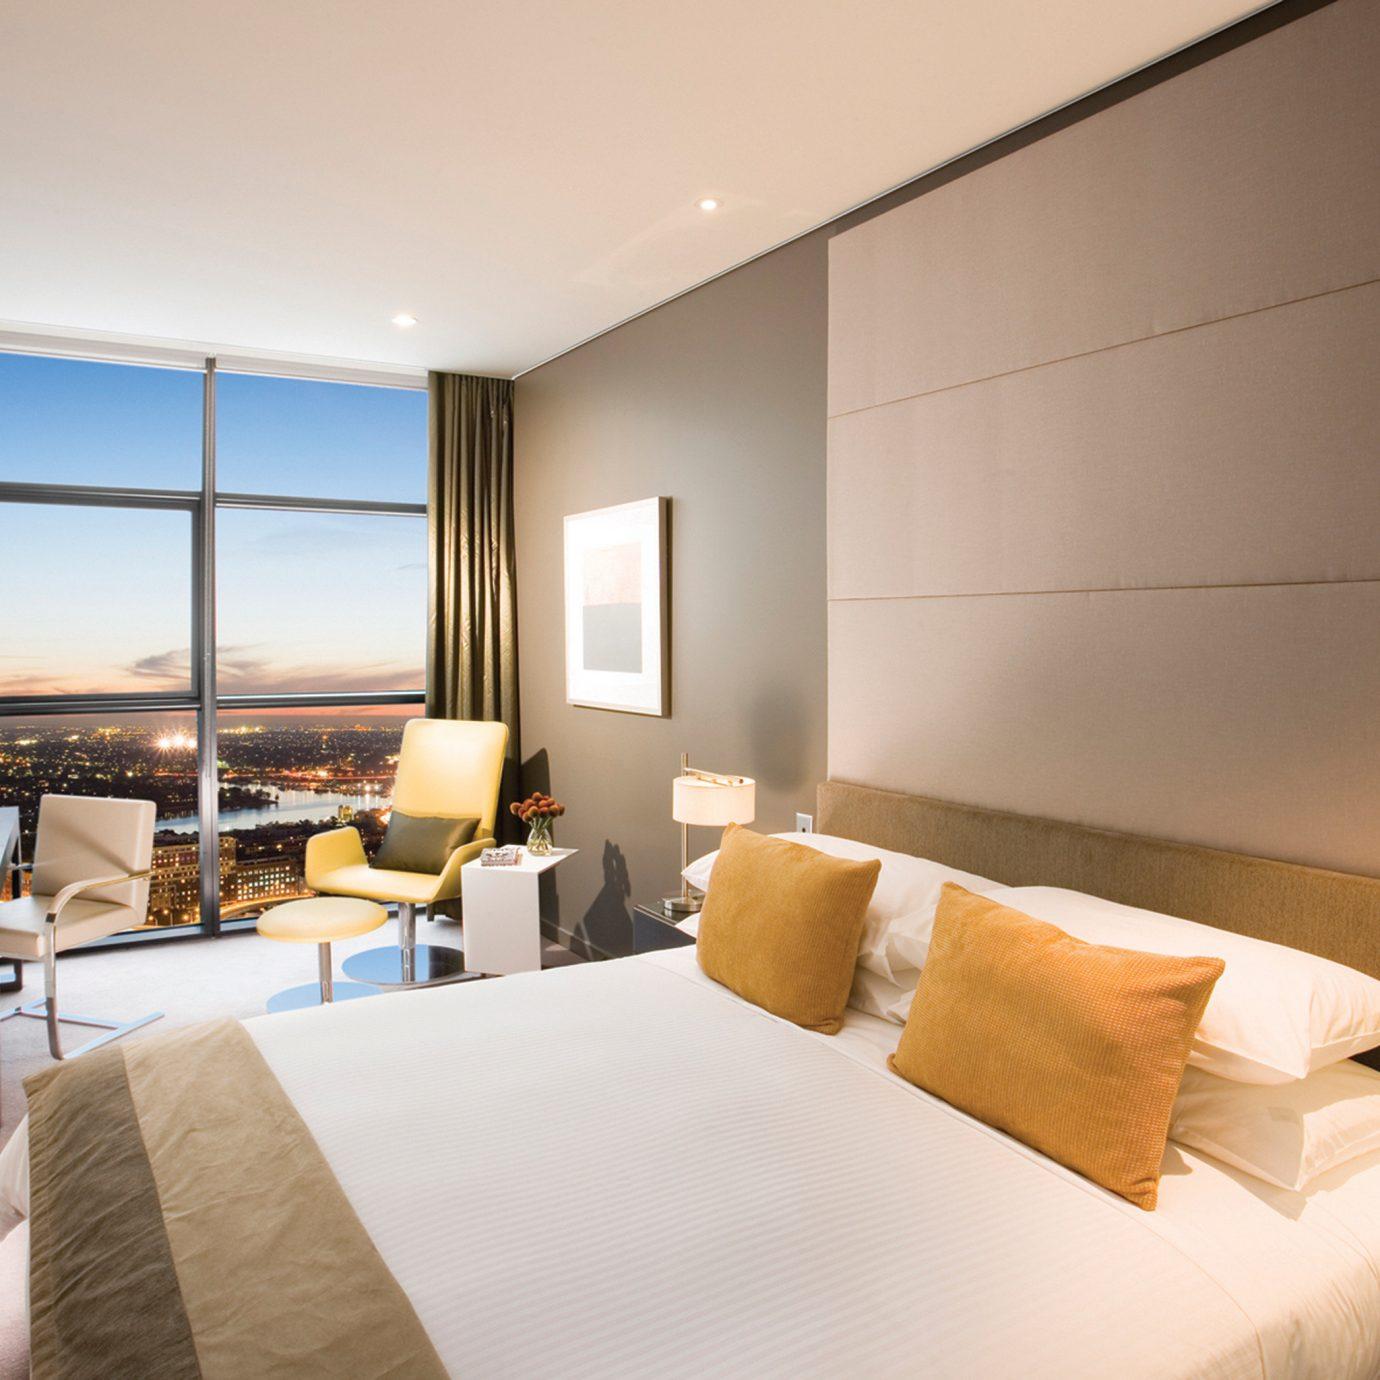 Bedroom Luxury Modern Scenic views Suite property condominium living room nice lamp flat